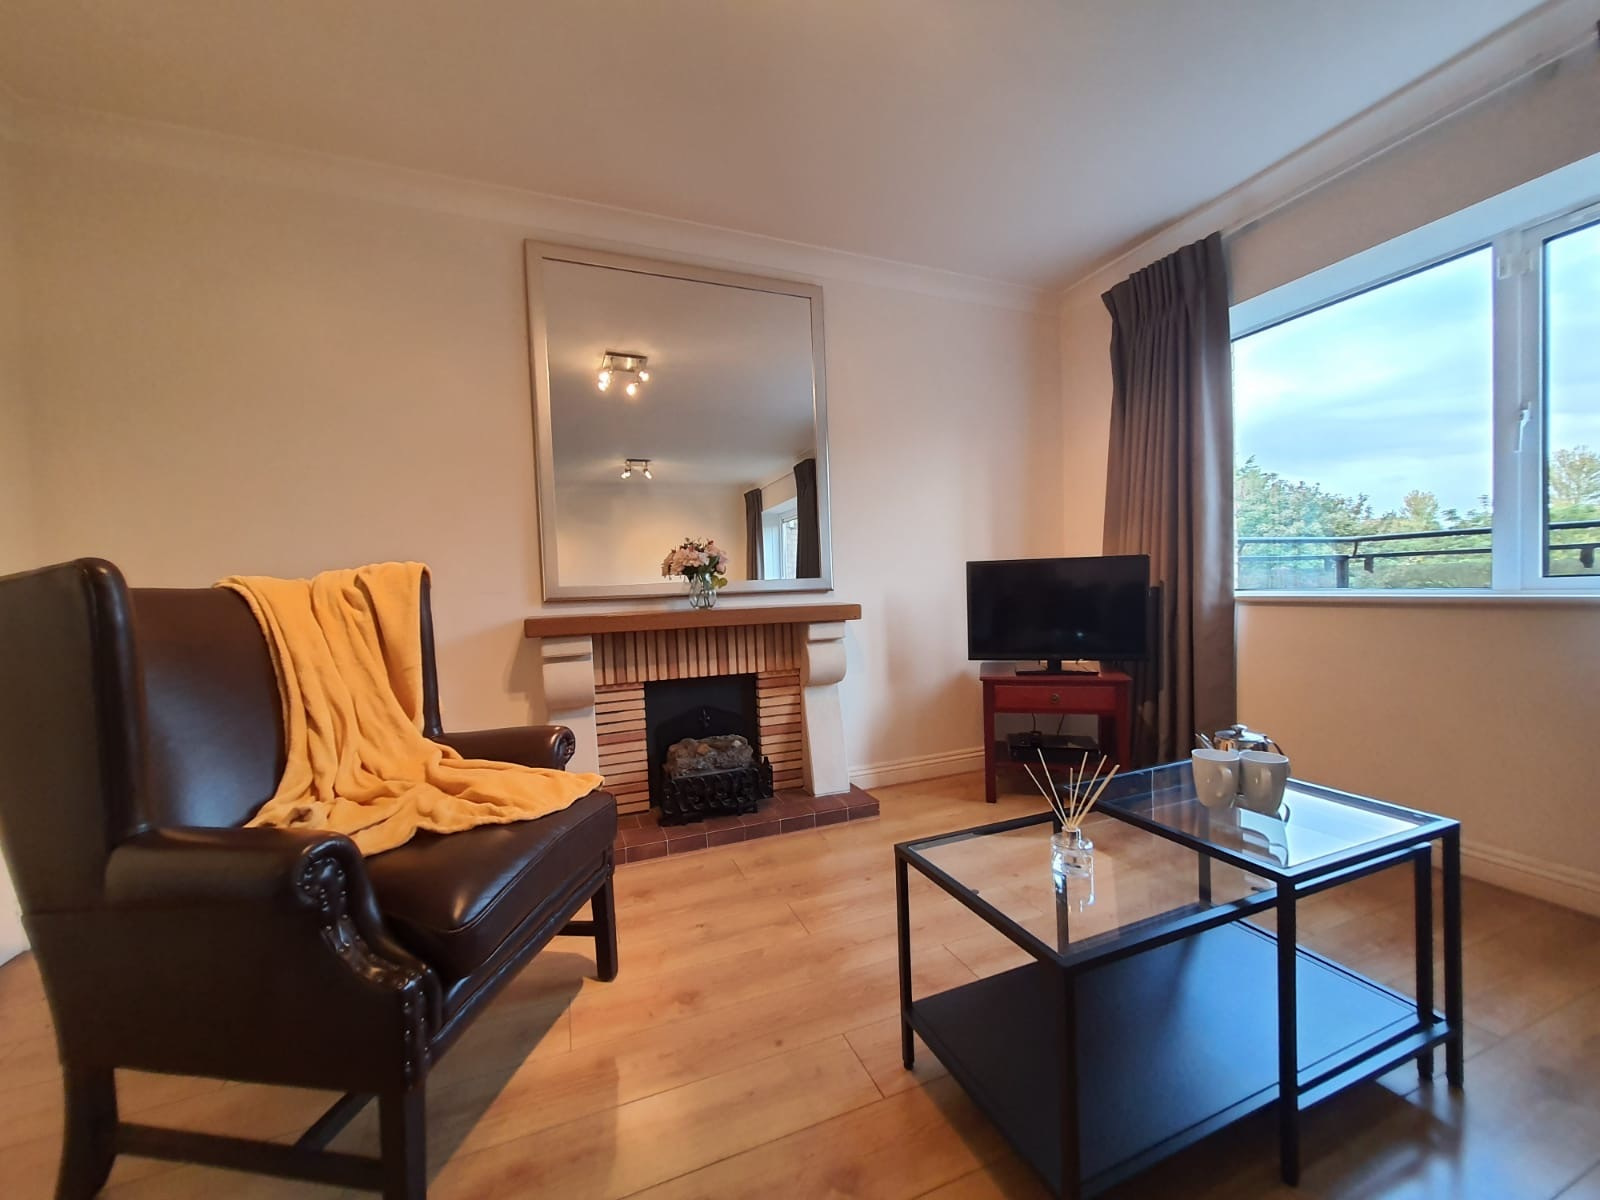 Ashbrook (2B) Penthouse, Ashbrook, Howth Road, Clontarf, Dublin 3